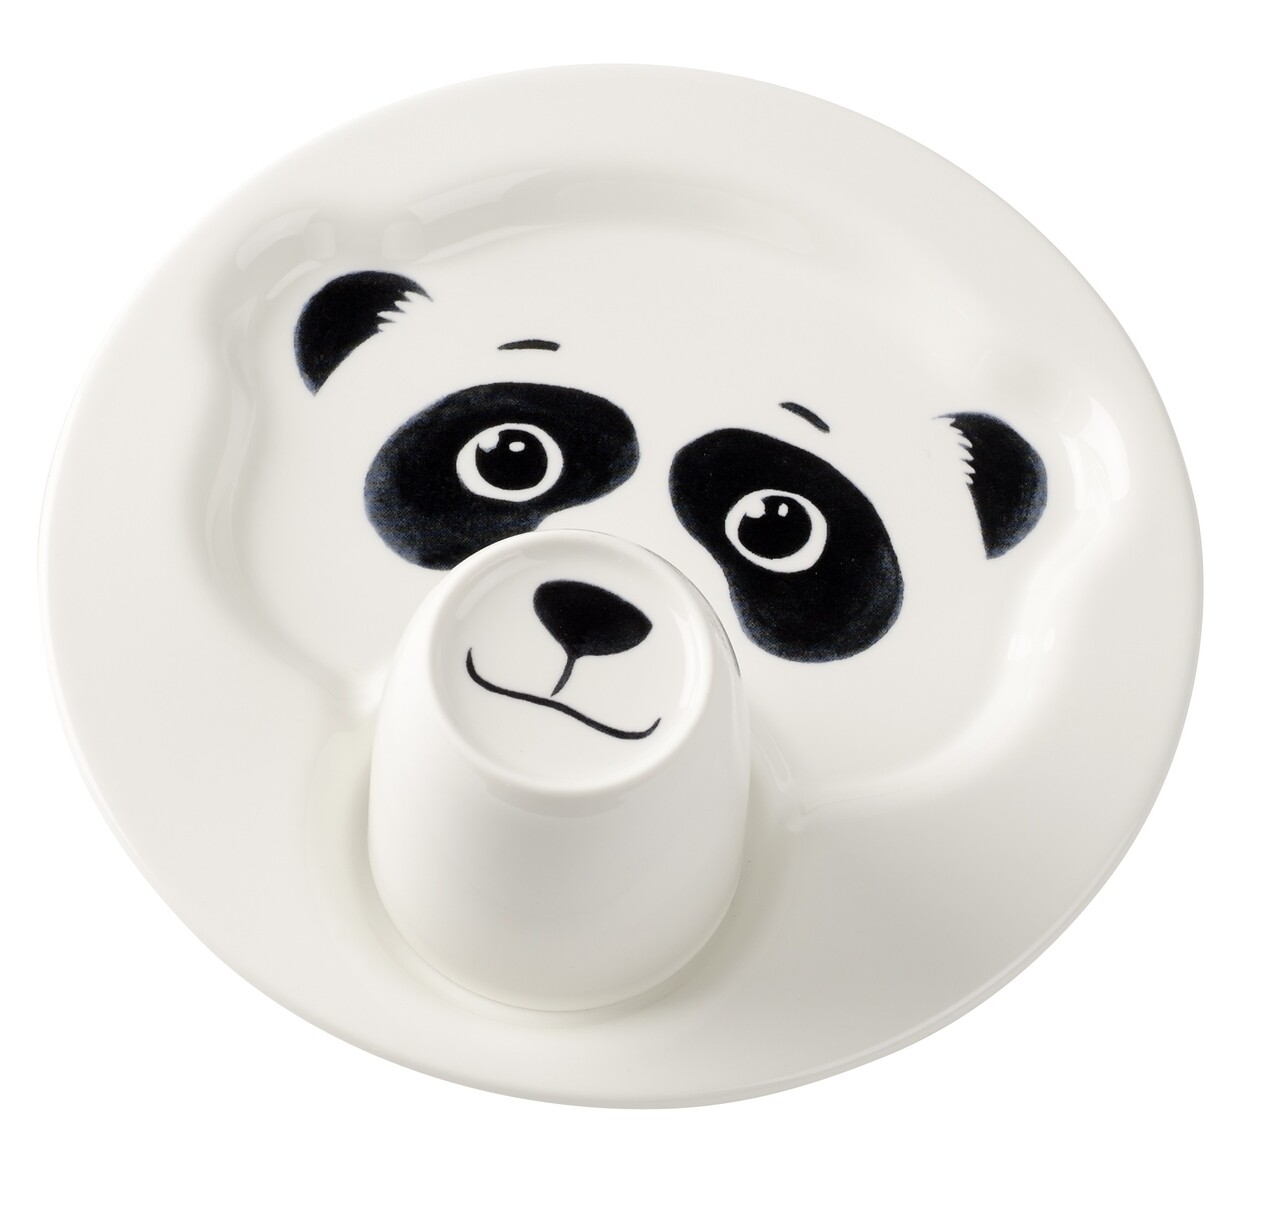 Set mic dejun copii 2 piese, Villeroy & Boch, Animal Friends Panda, Ø 22 cm/190 ml, portelan premium